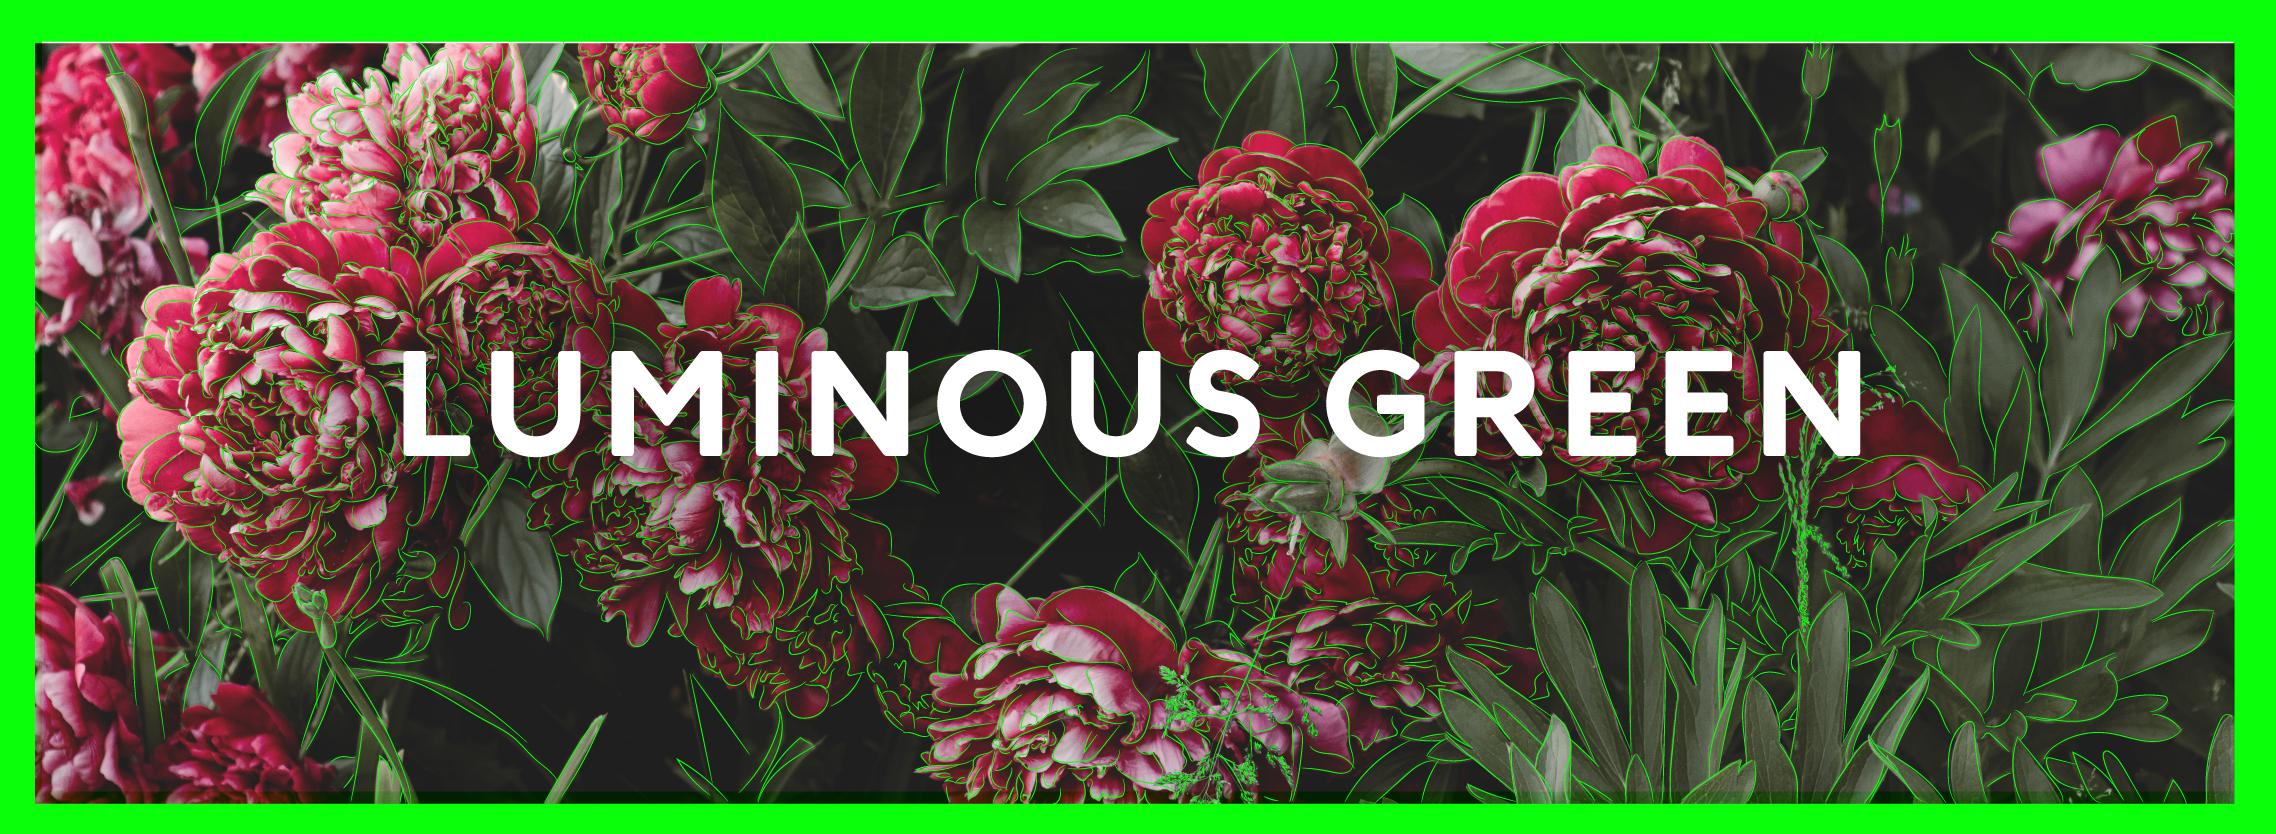 Icon for luminous green